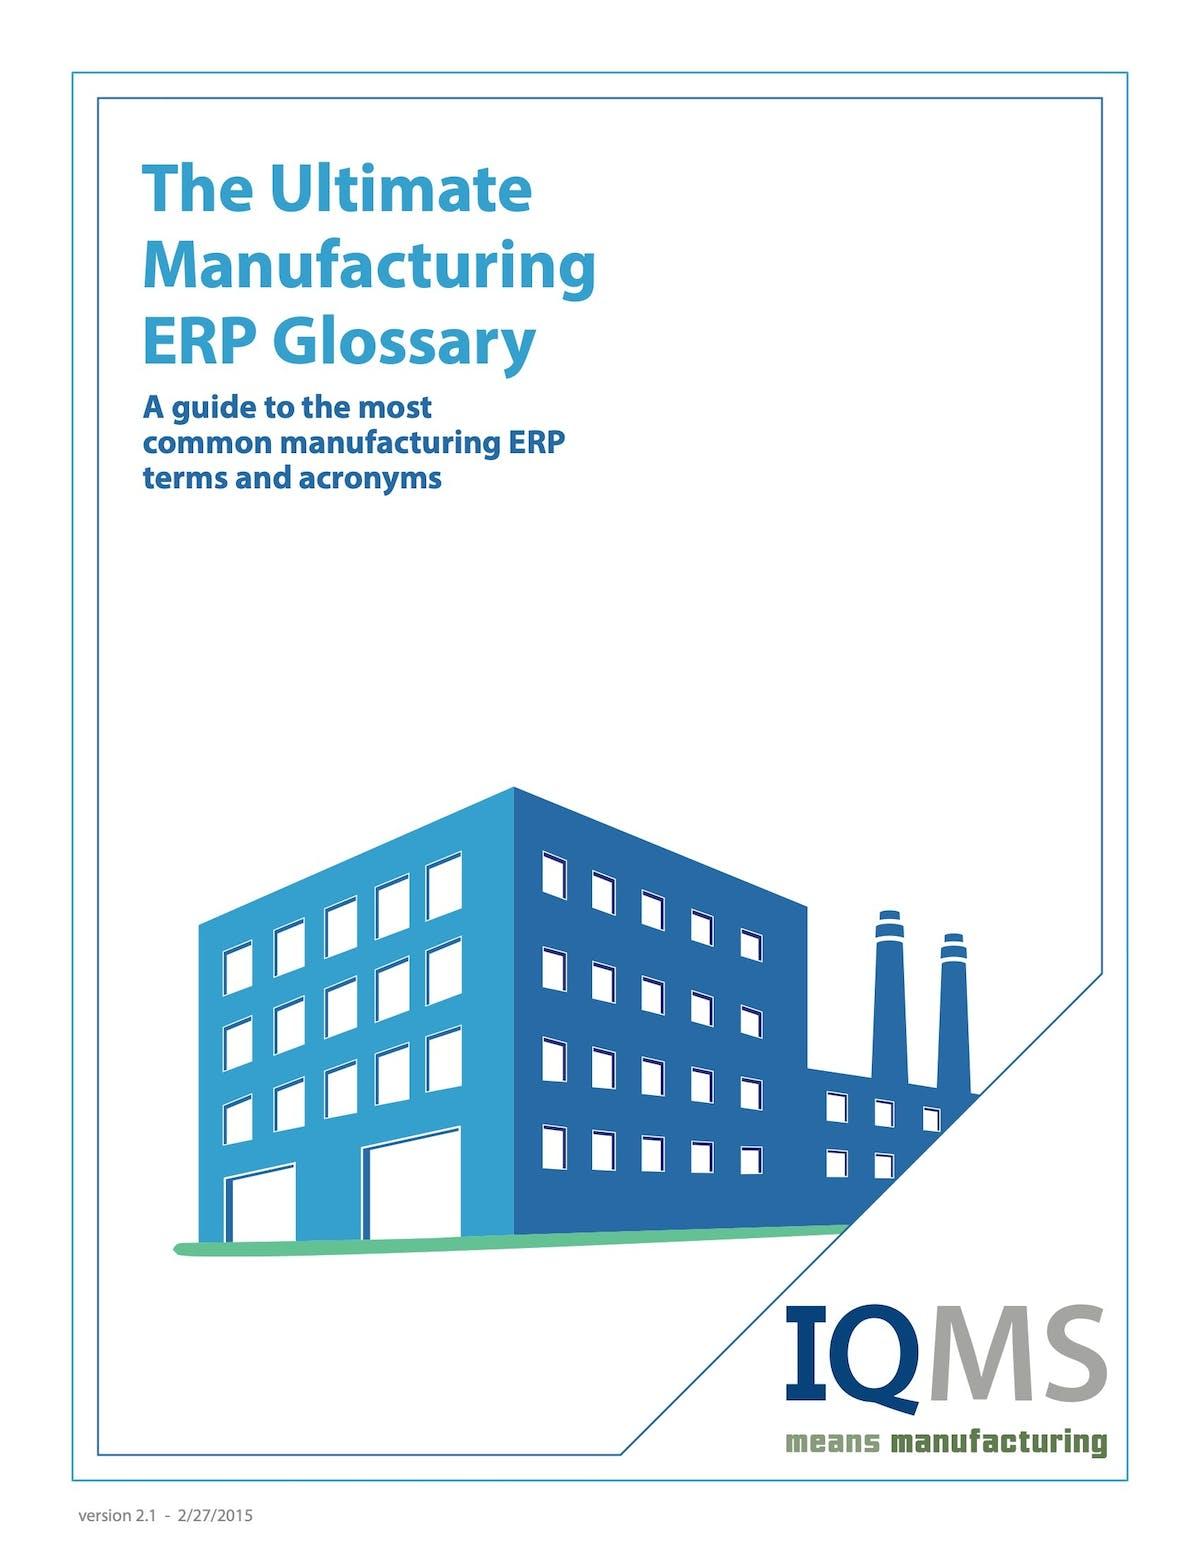 EnterpriseIQ White Paper - The Ultimate Manufacturing ERP Glossary